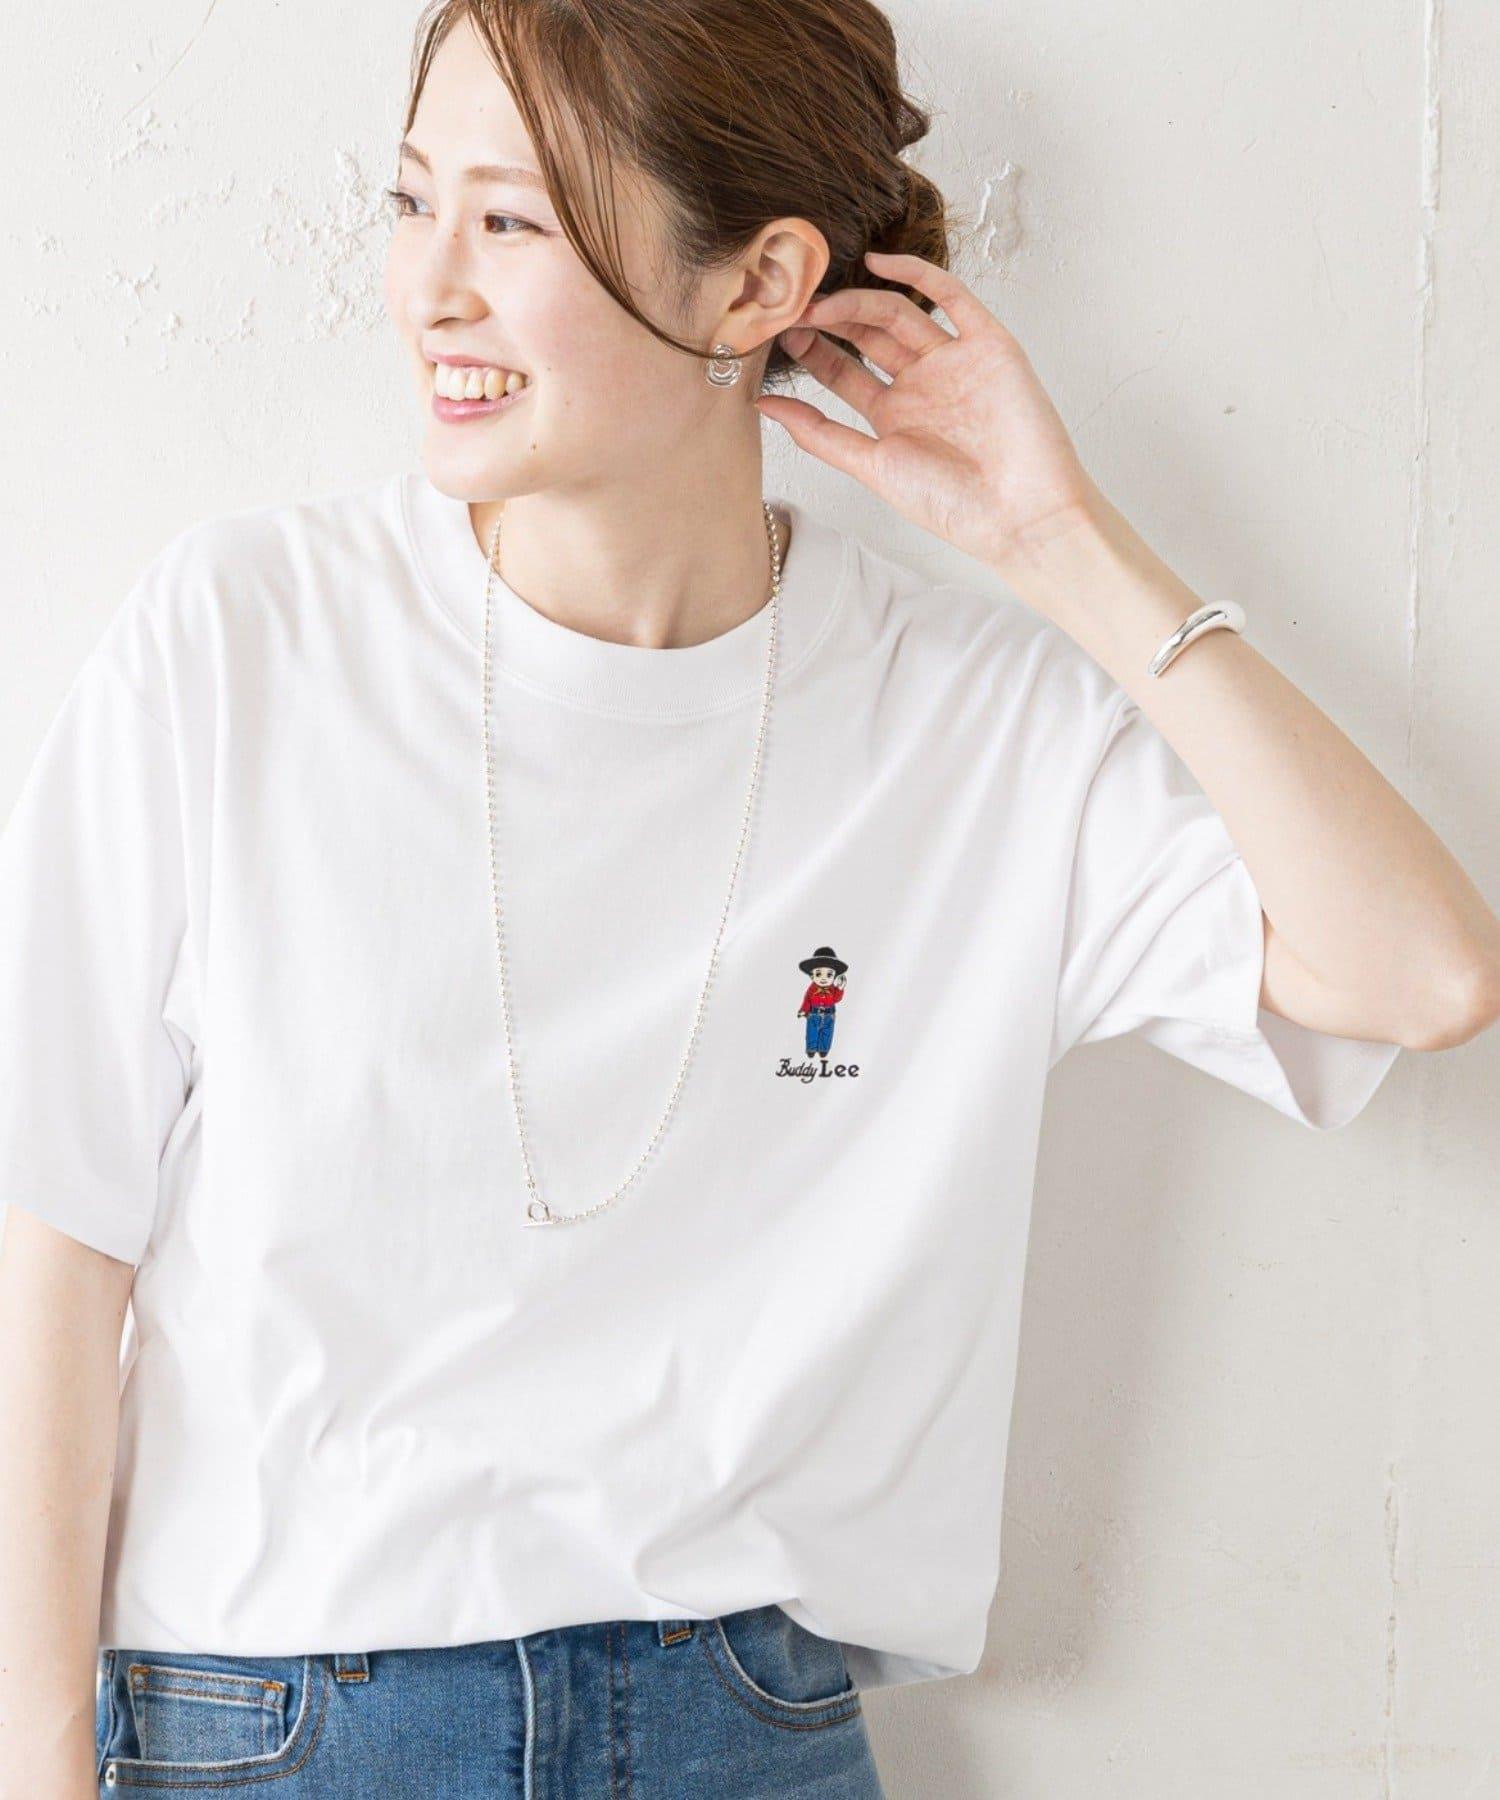 CIAOPANIC TYPY(チャオパニックティピー) レディース 【Lee×CIAOPANIC TYPY】BuddyLee刺繍Tee ホワイト